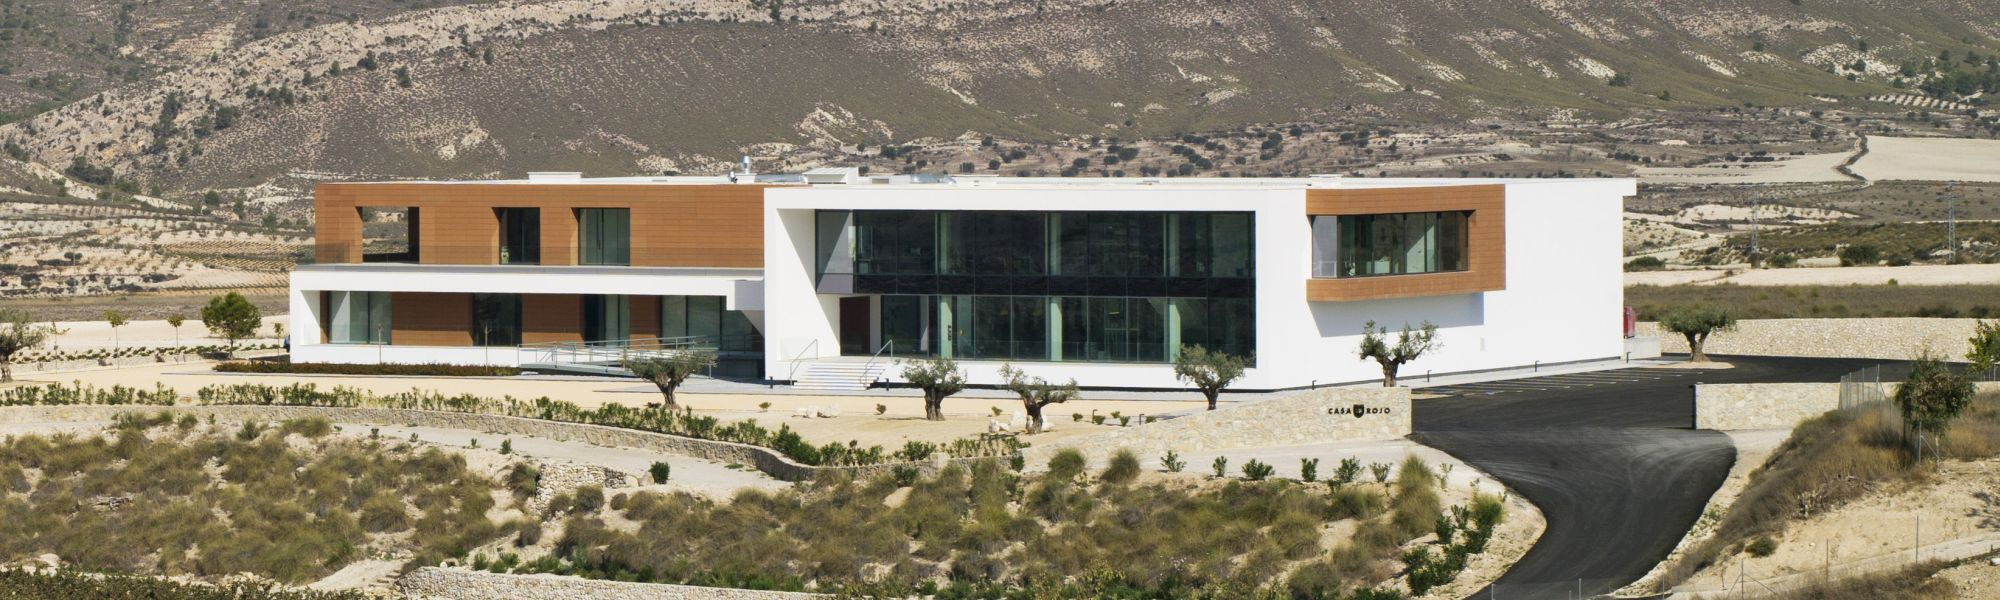 Weingut Casa Rojo Spanien Gebäude